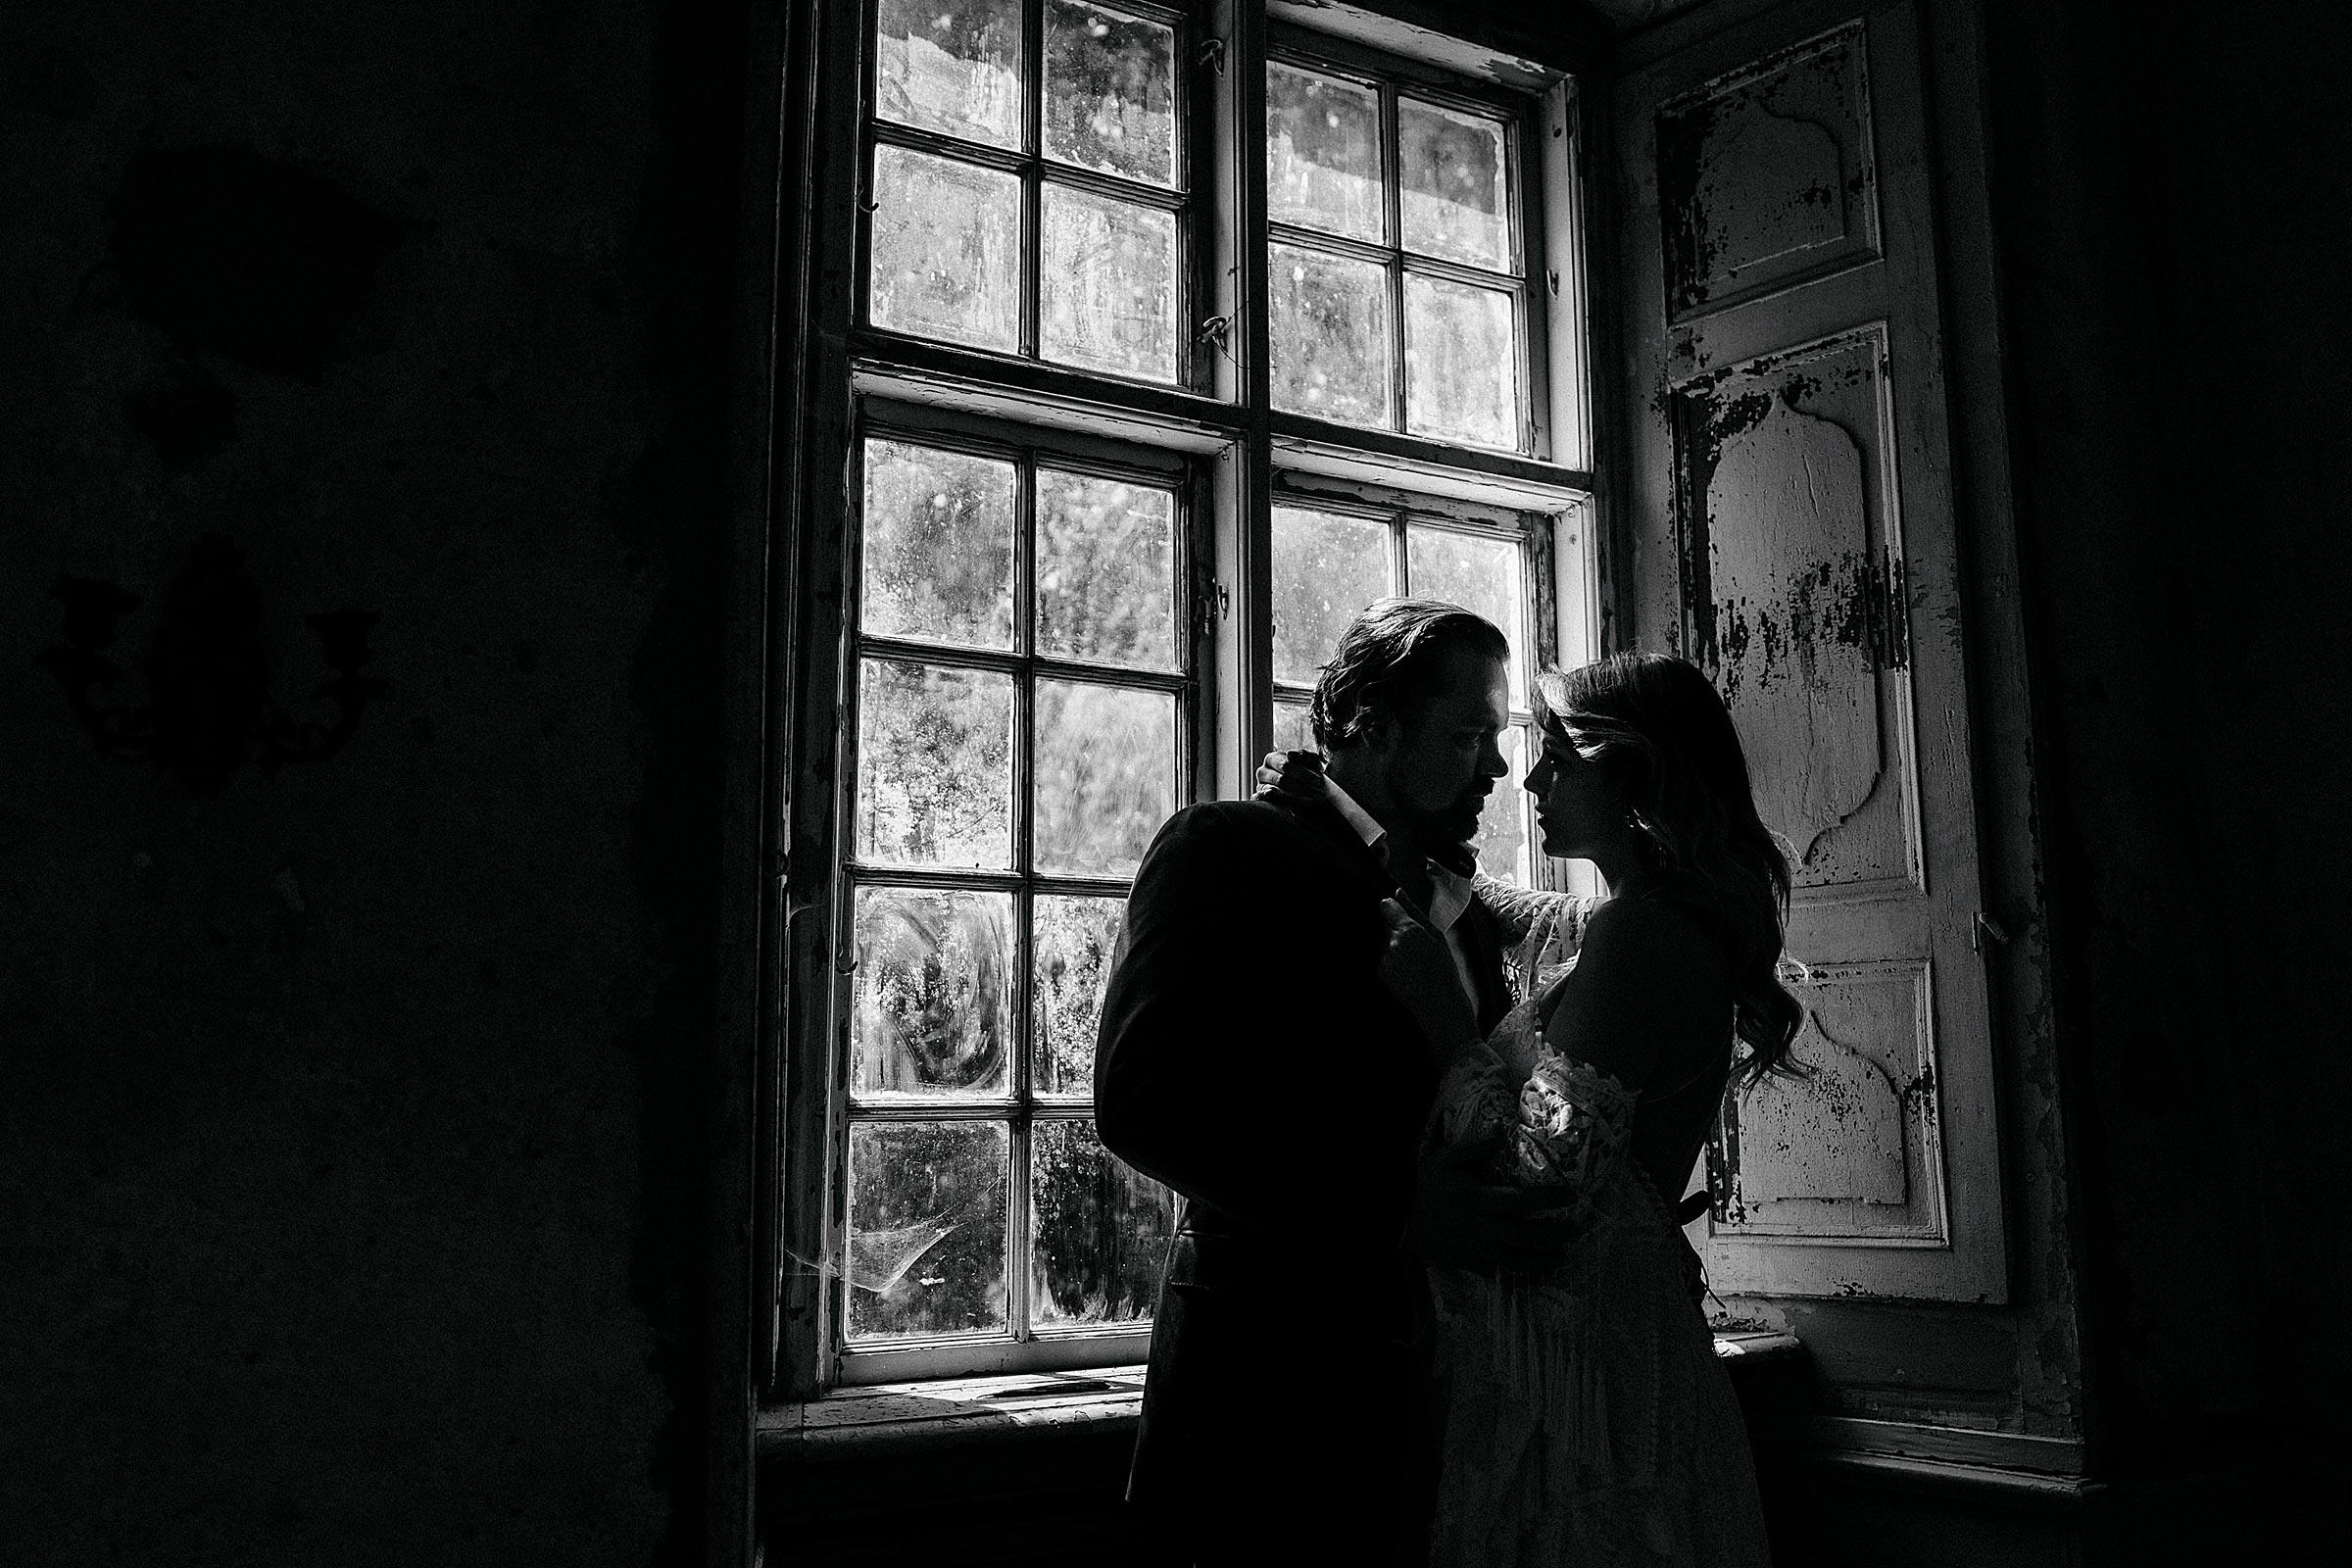 Hochzeitsfotograf Rostock-Neubrandenburg-Mecklenburg-Vorpommern